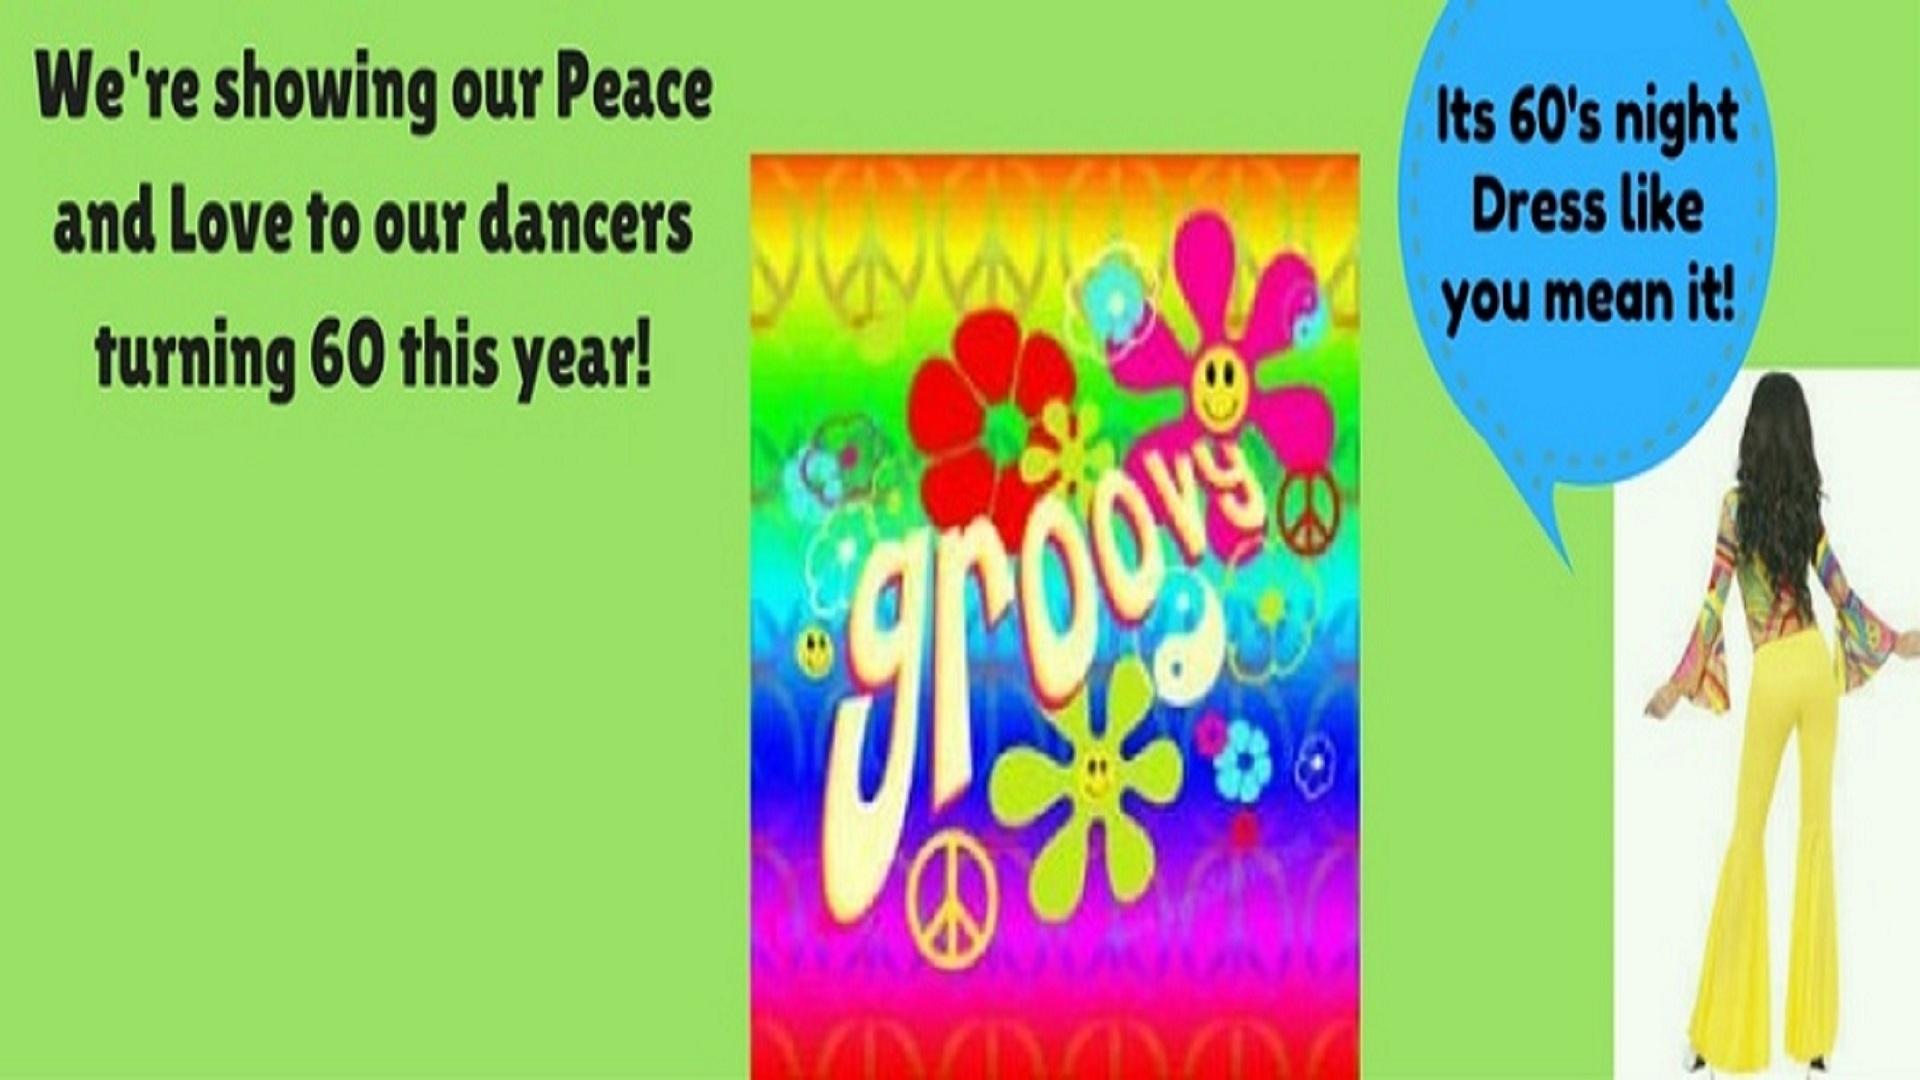 60s-dance